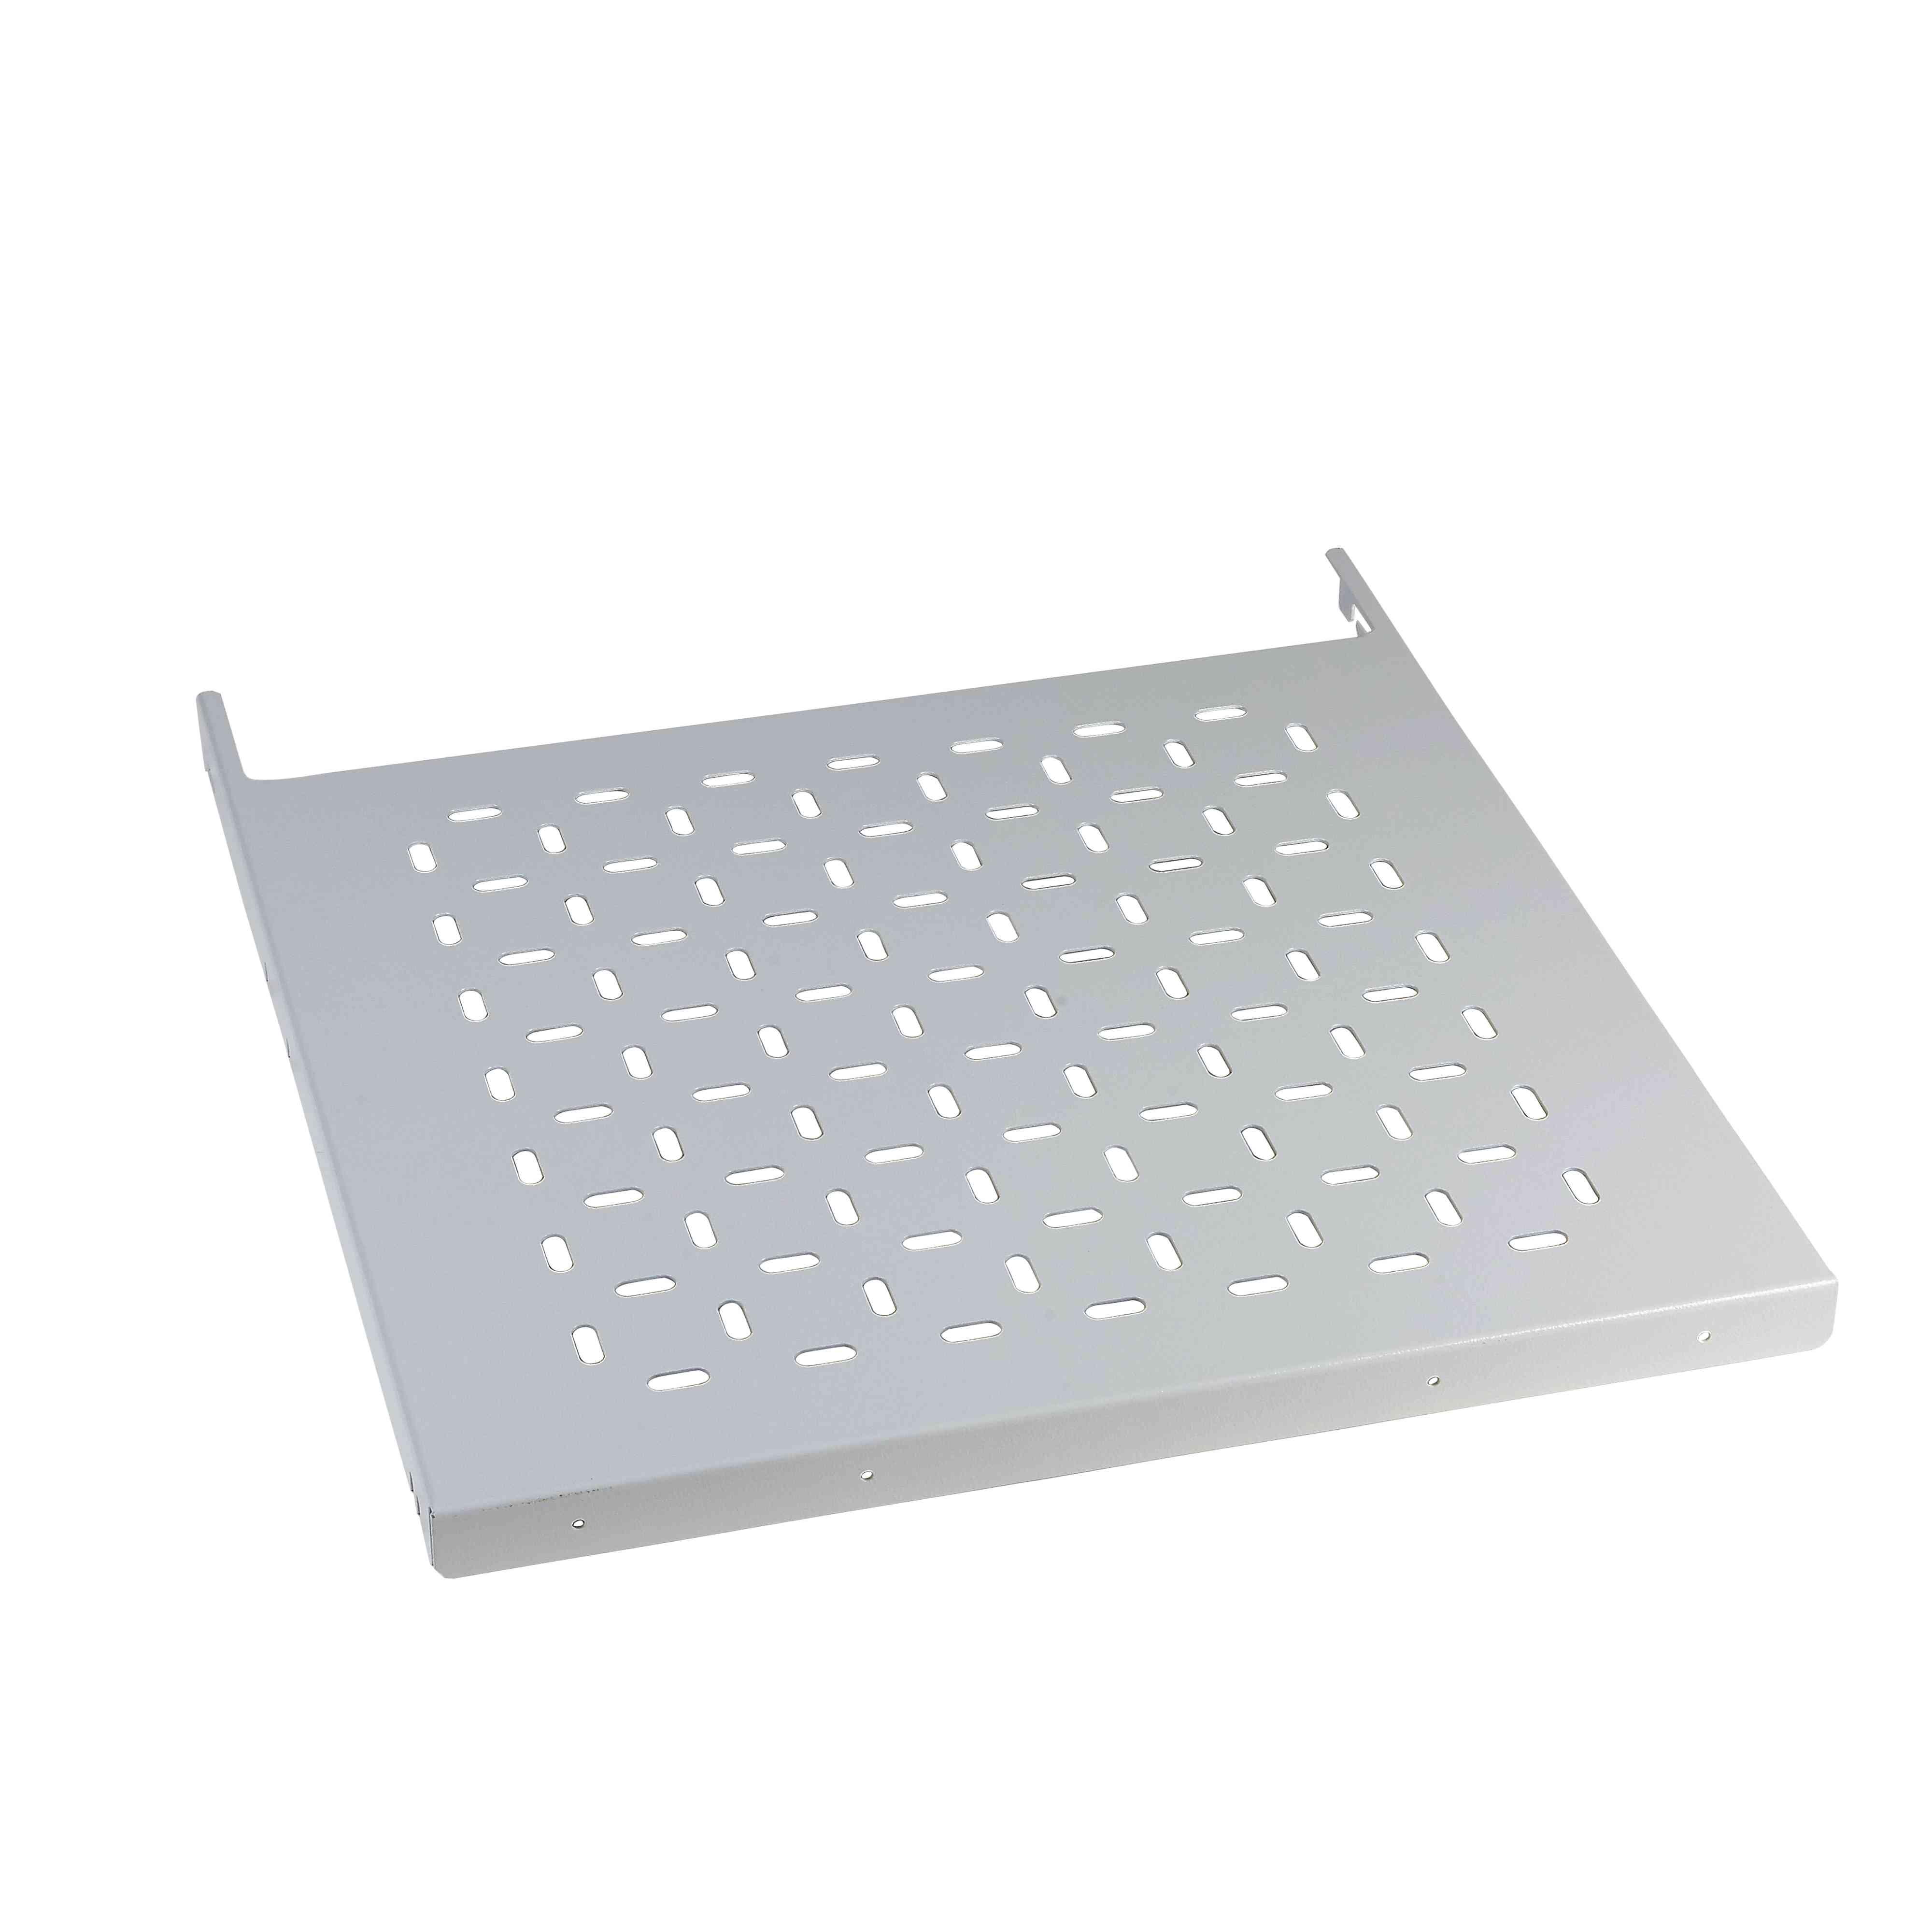 Fiksni pladenj V30xŠ482xG490 mm za omaro Š600xG600 mm - maks. obrem. 50 kg